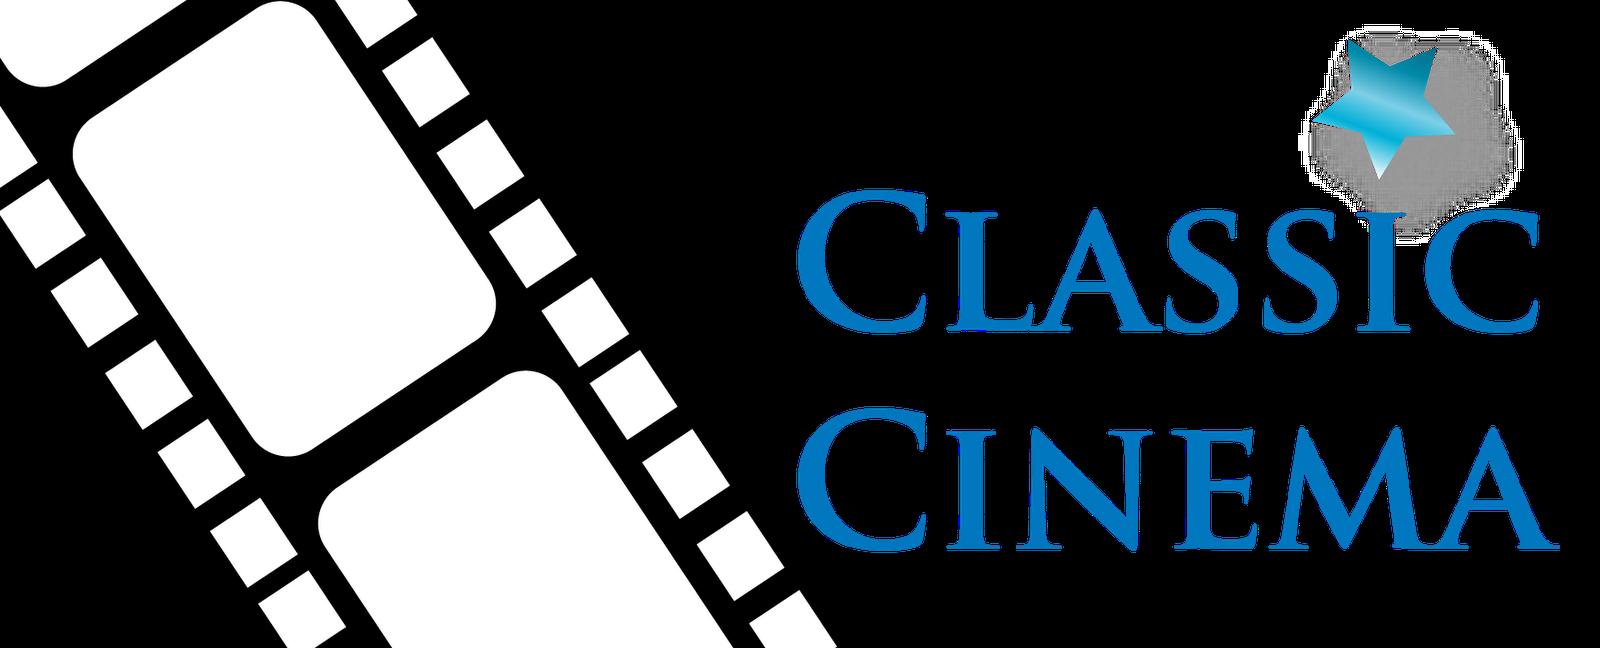 Classic Cinema Et 1982 30th Aniversay